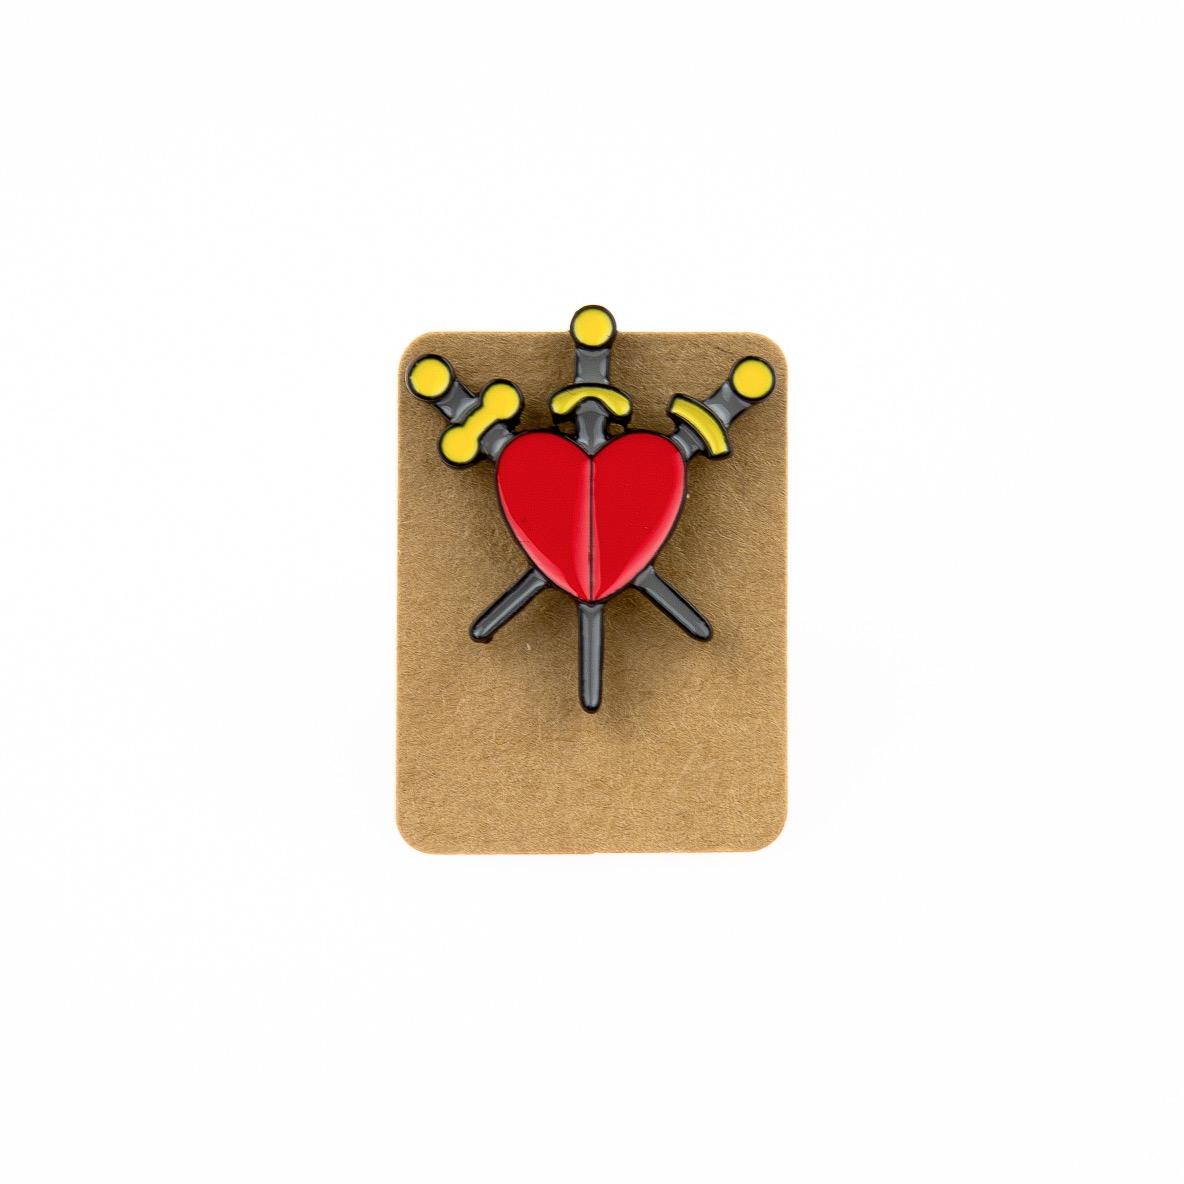 Metal Heart Three of Swords Enamel Pin Badge